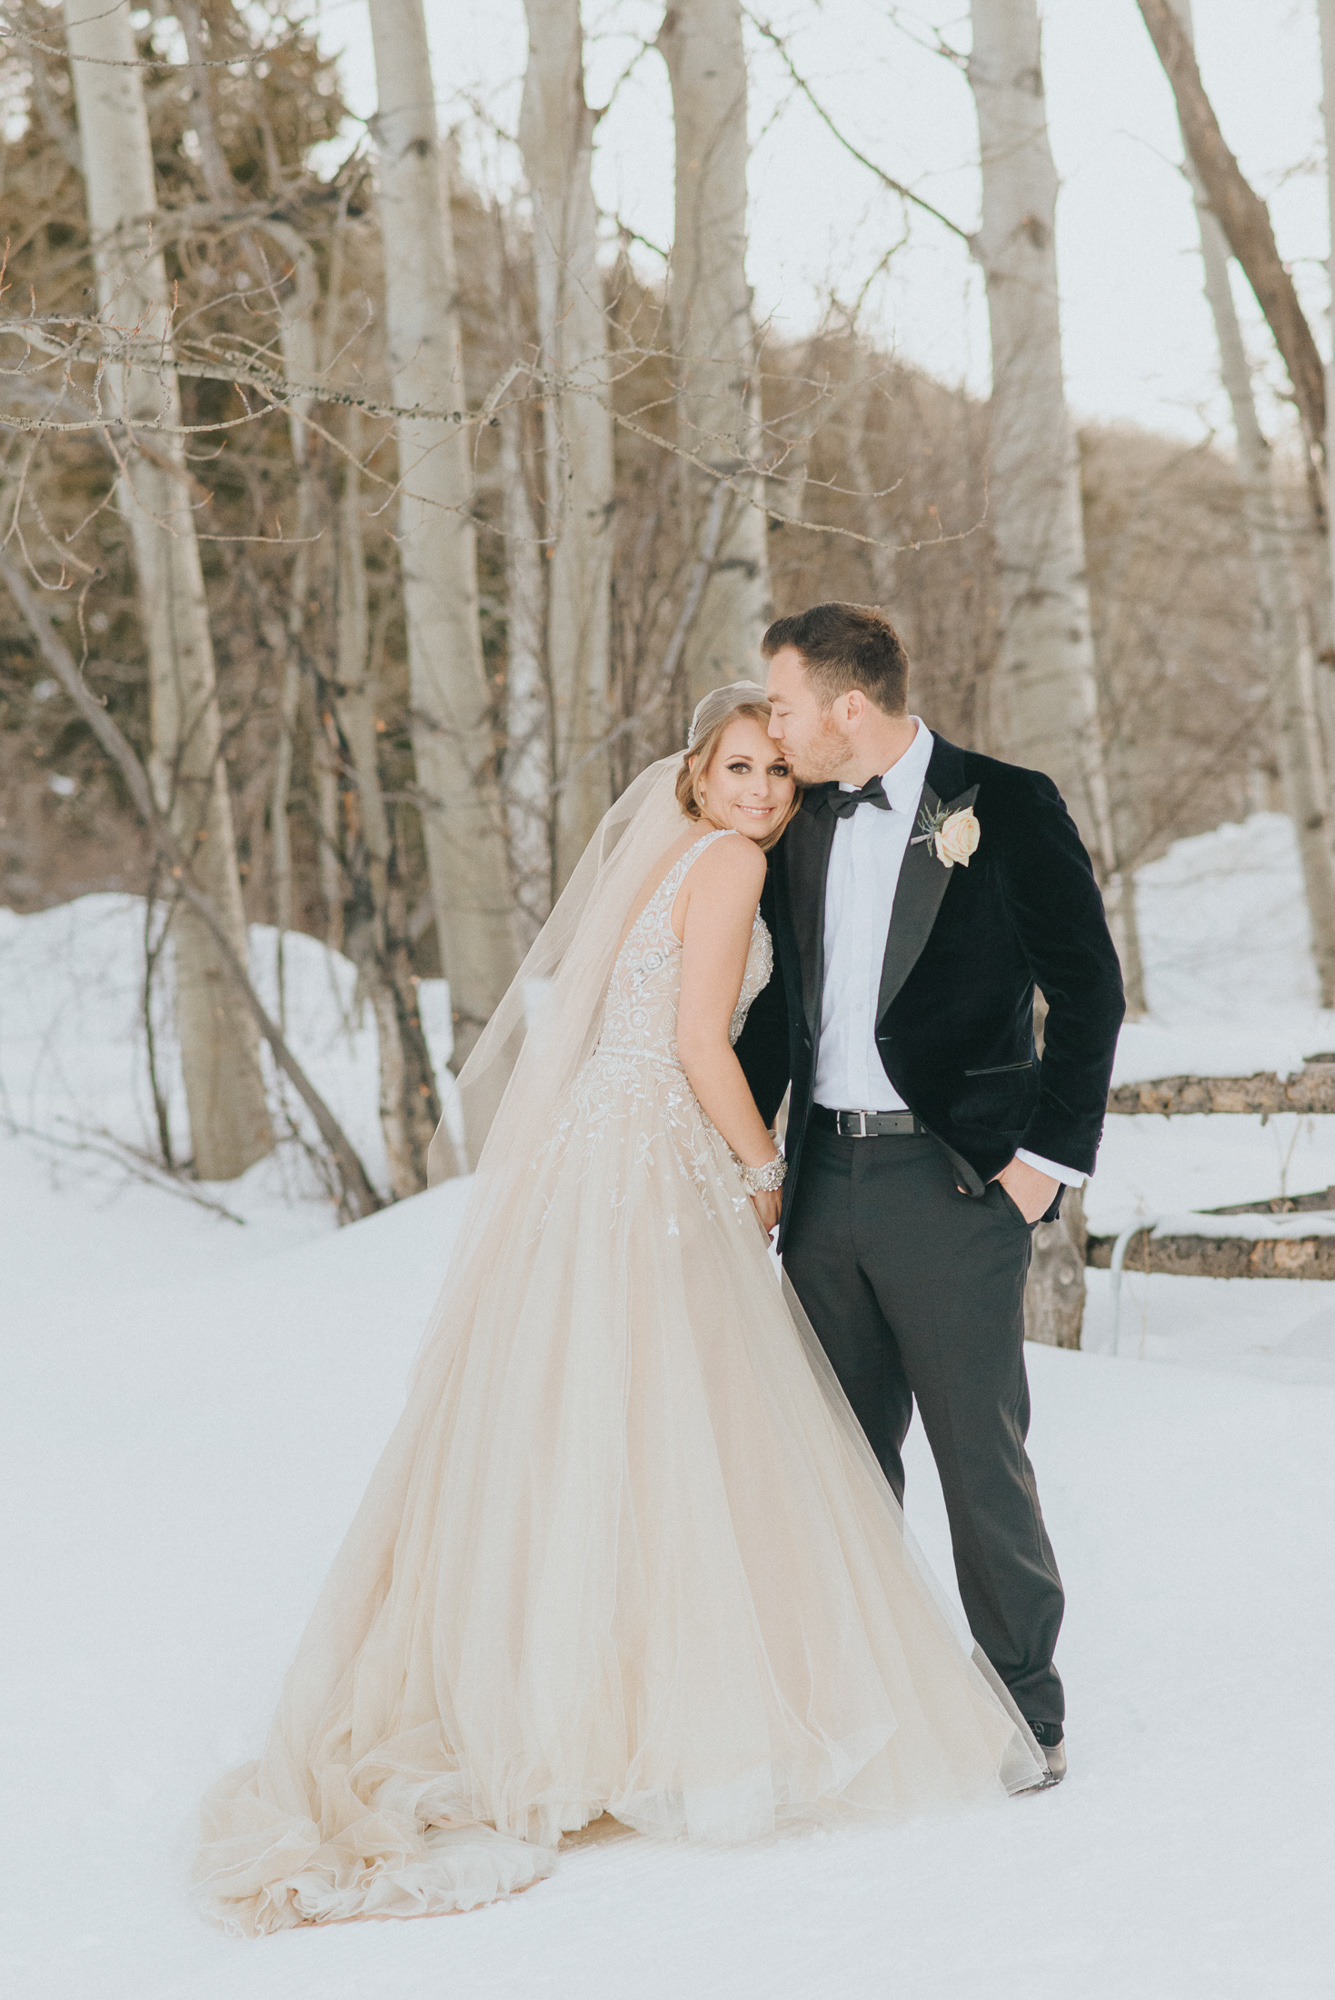 winter snow portrait bride groom snow aspen